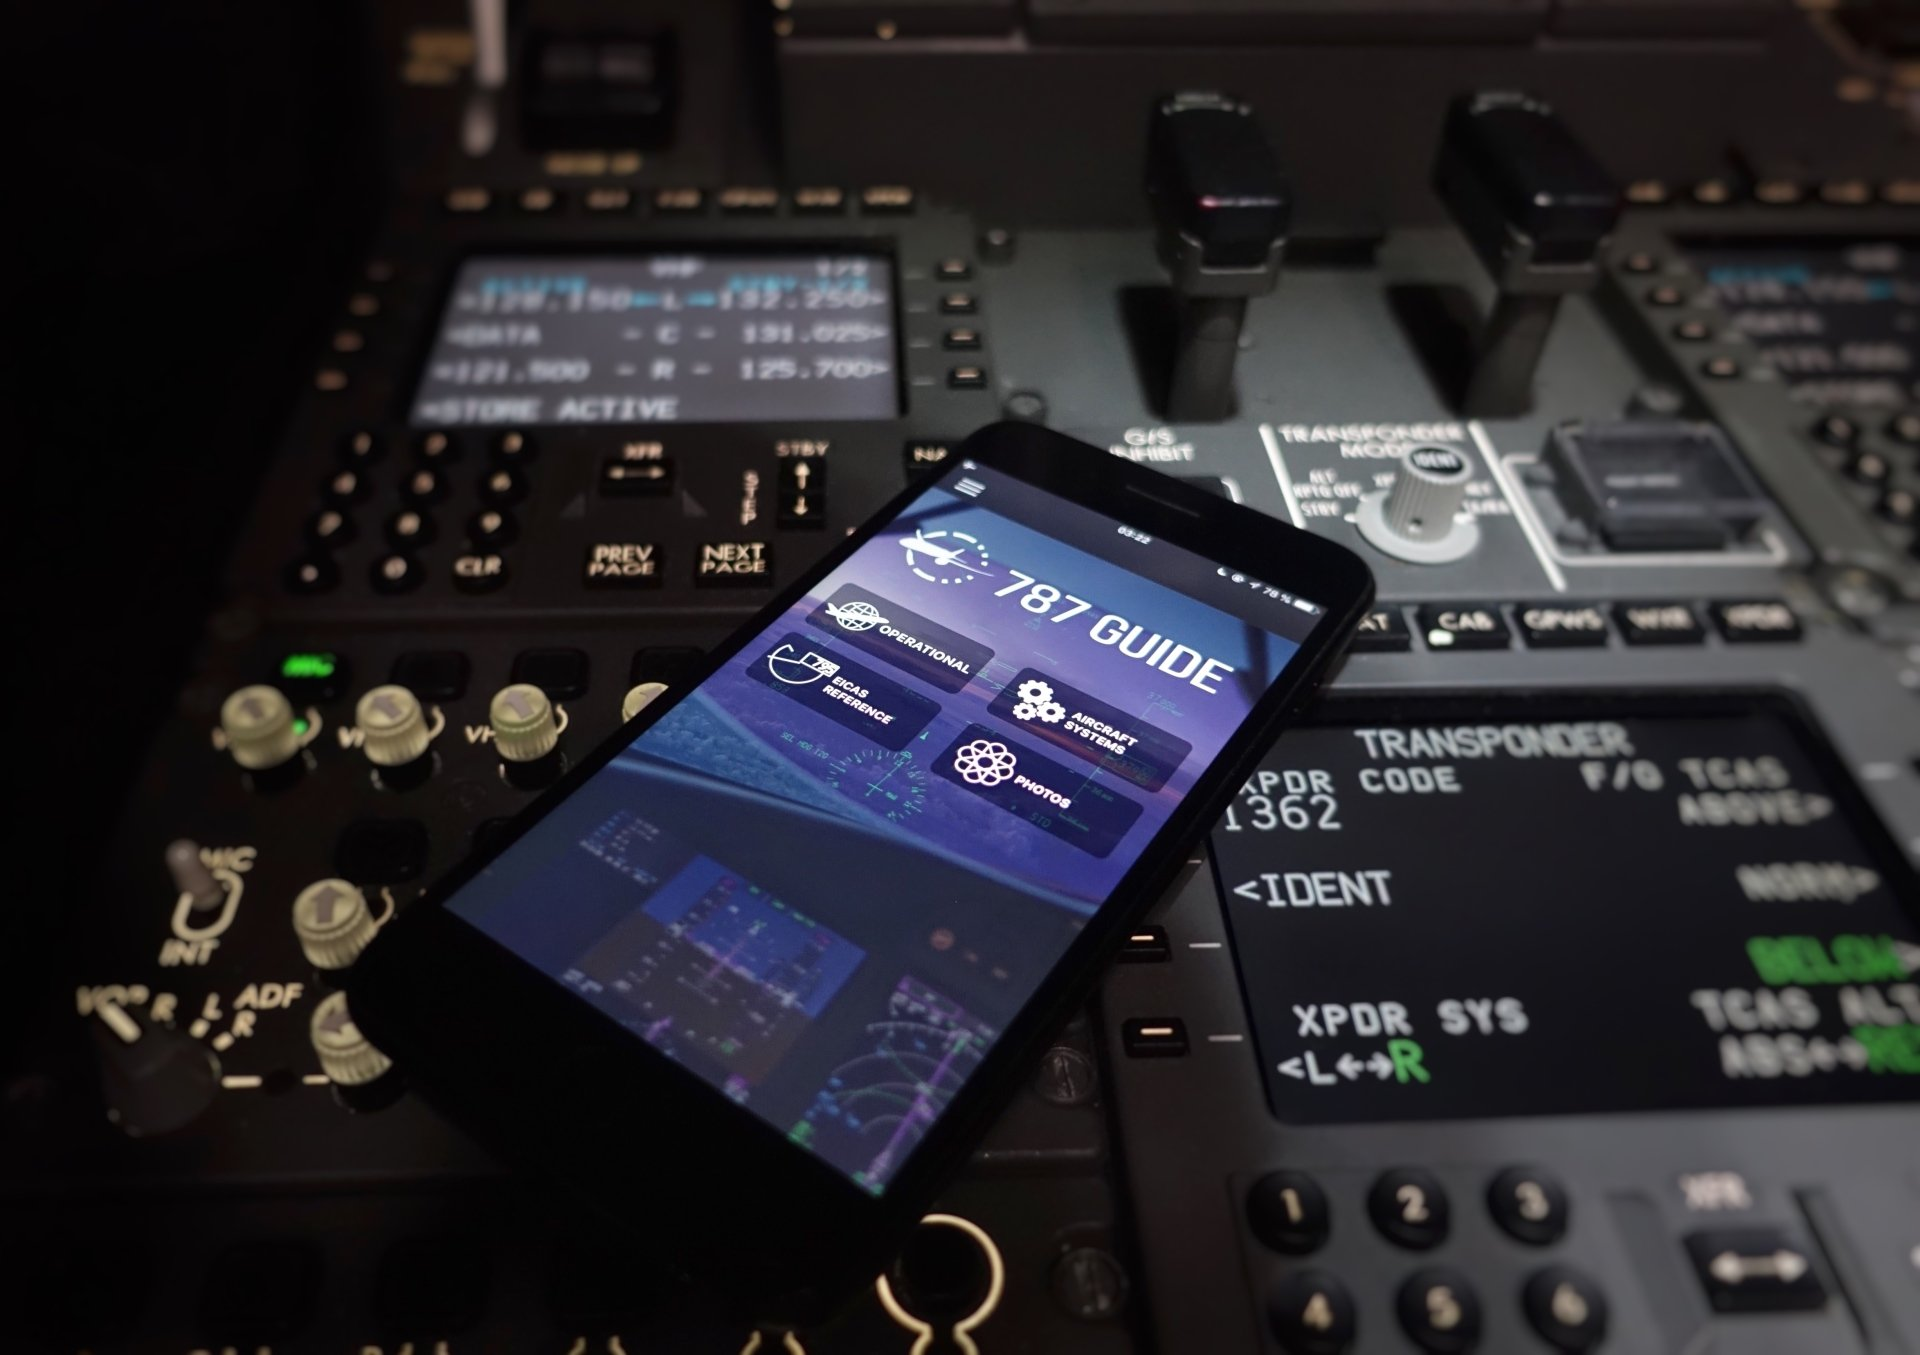 787 Type Rating preparation